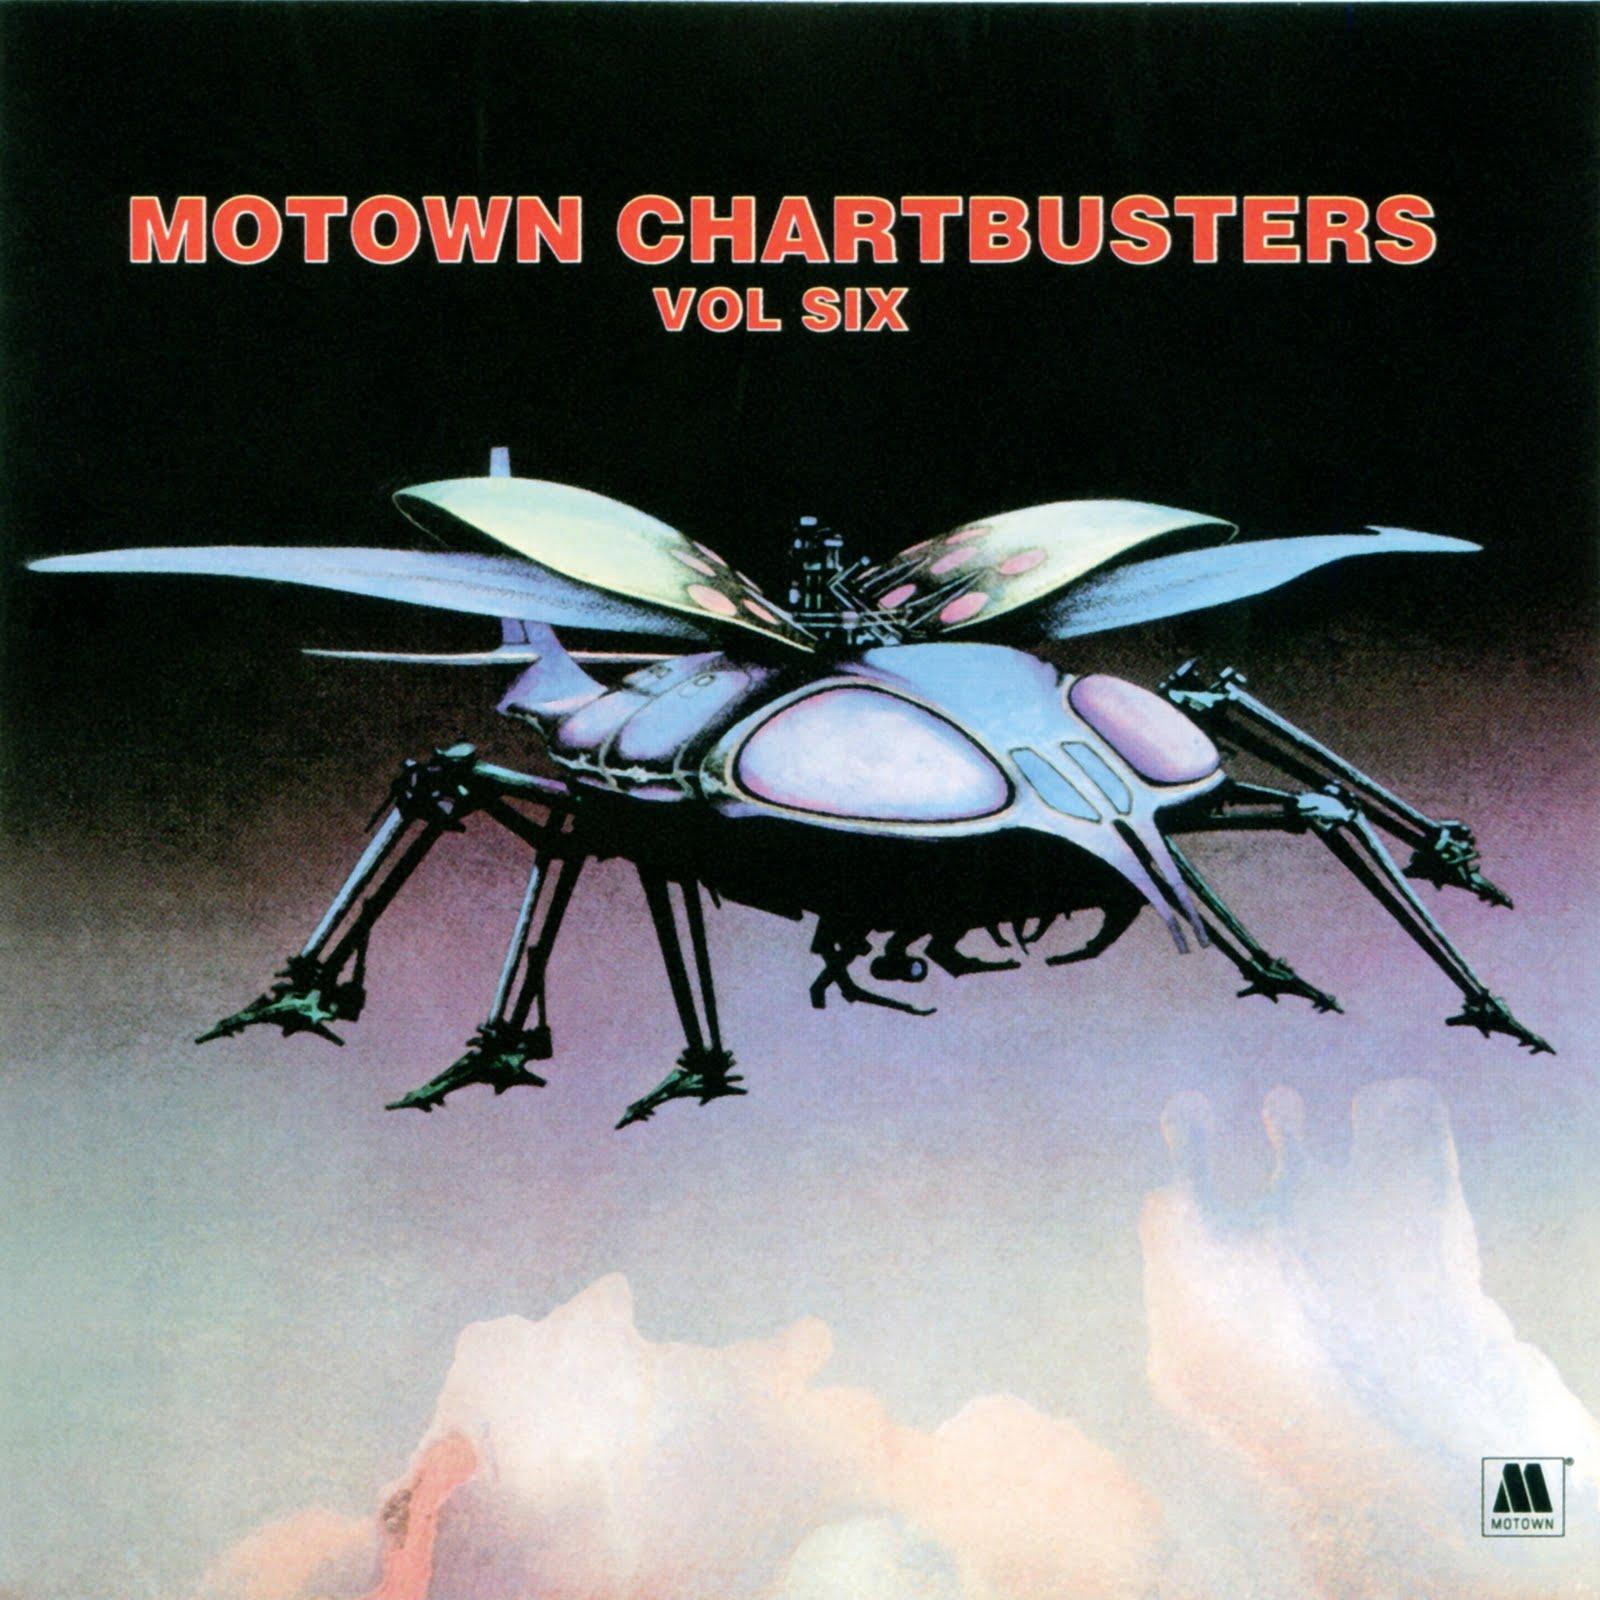 Various Artists - Motown Chartbusters, Vol. Six album cover